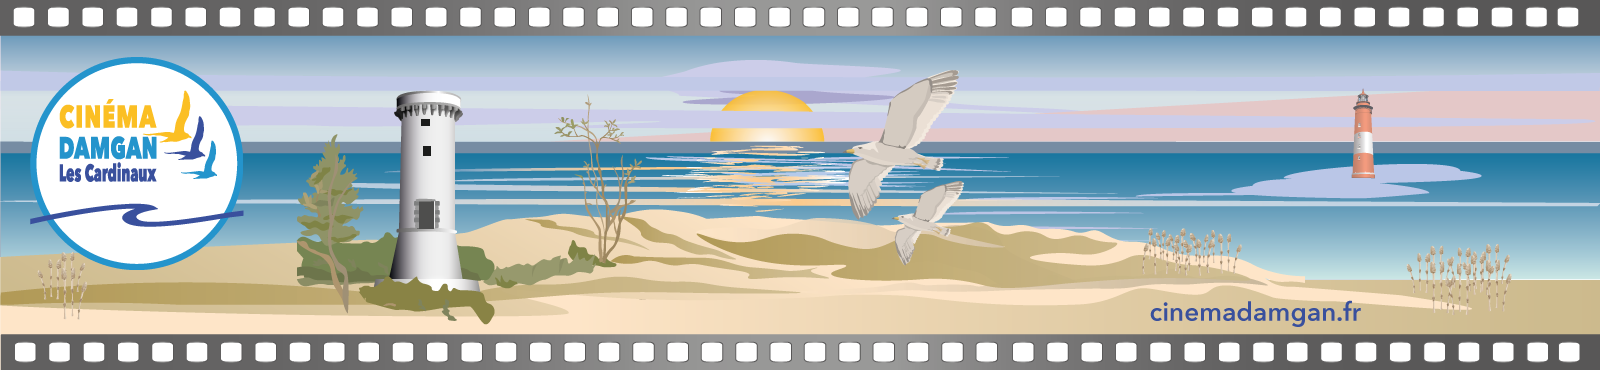 Banniere-logo-cinema-damgan-film-plage-phare-tour